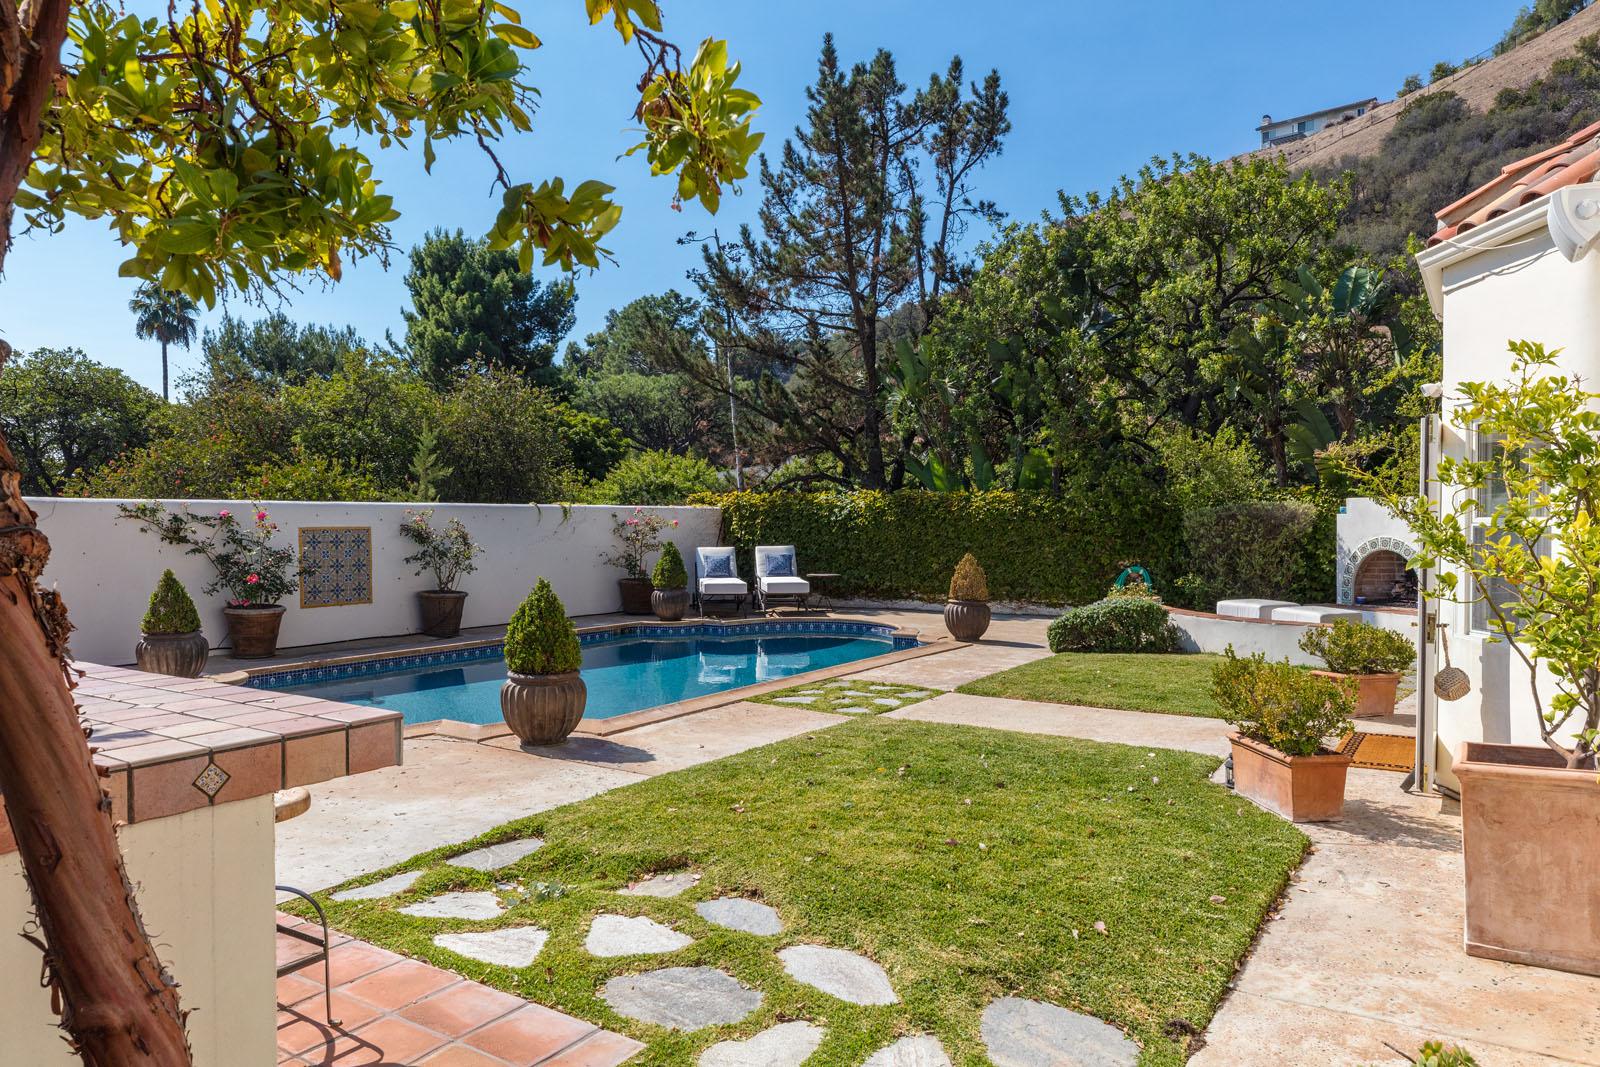 014 Pool 1712 Manzanita Park Avenue Malibu For Sale Lease The Malibu Life Team Luxury Real Estate.jpg